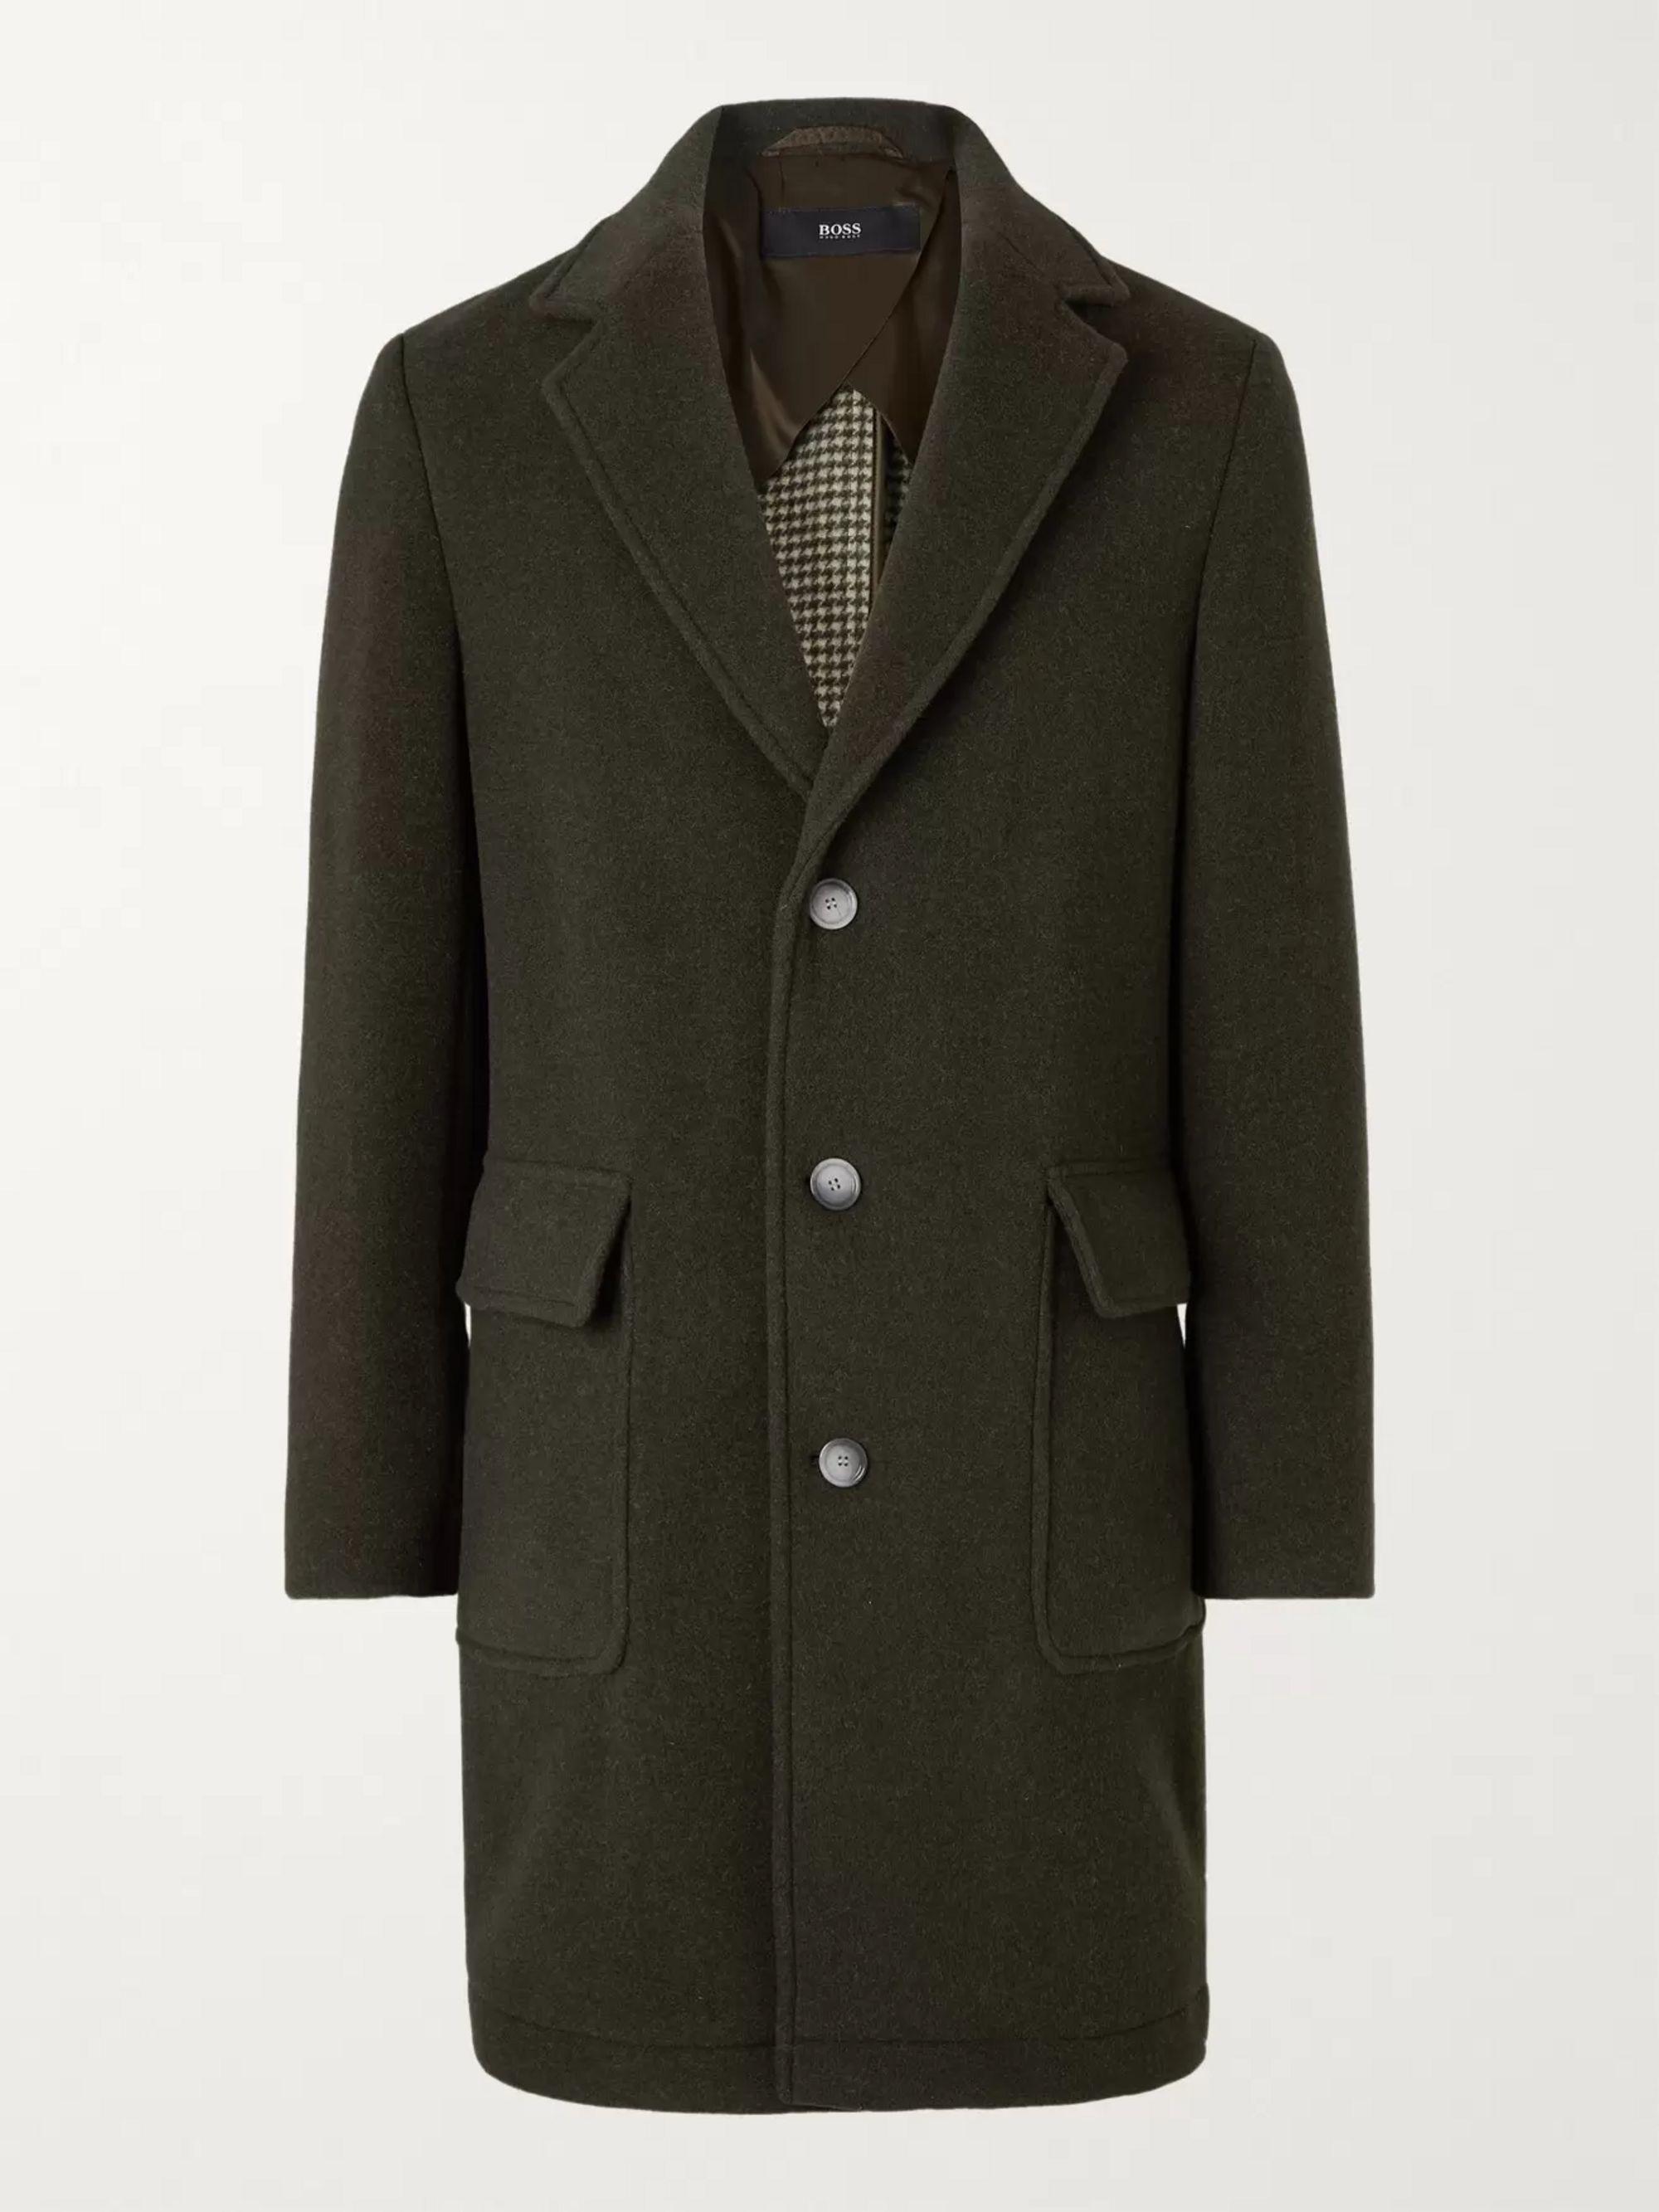 HUGO BOSS Slim-Fit Wool-Blend Coat